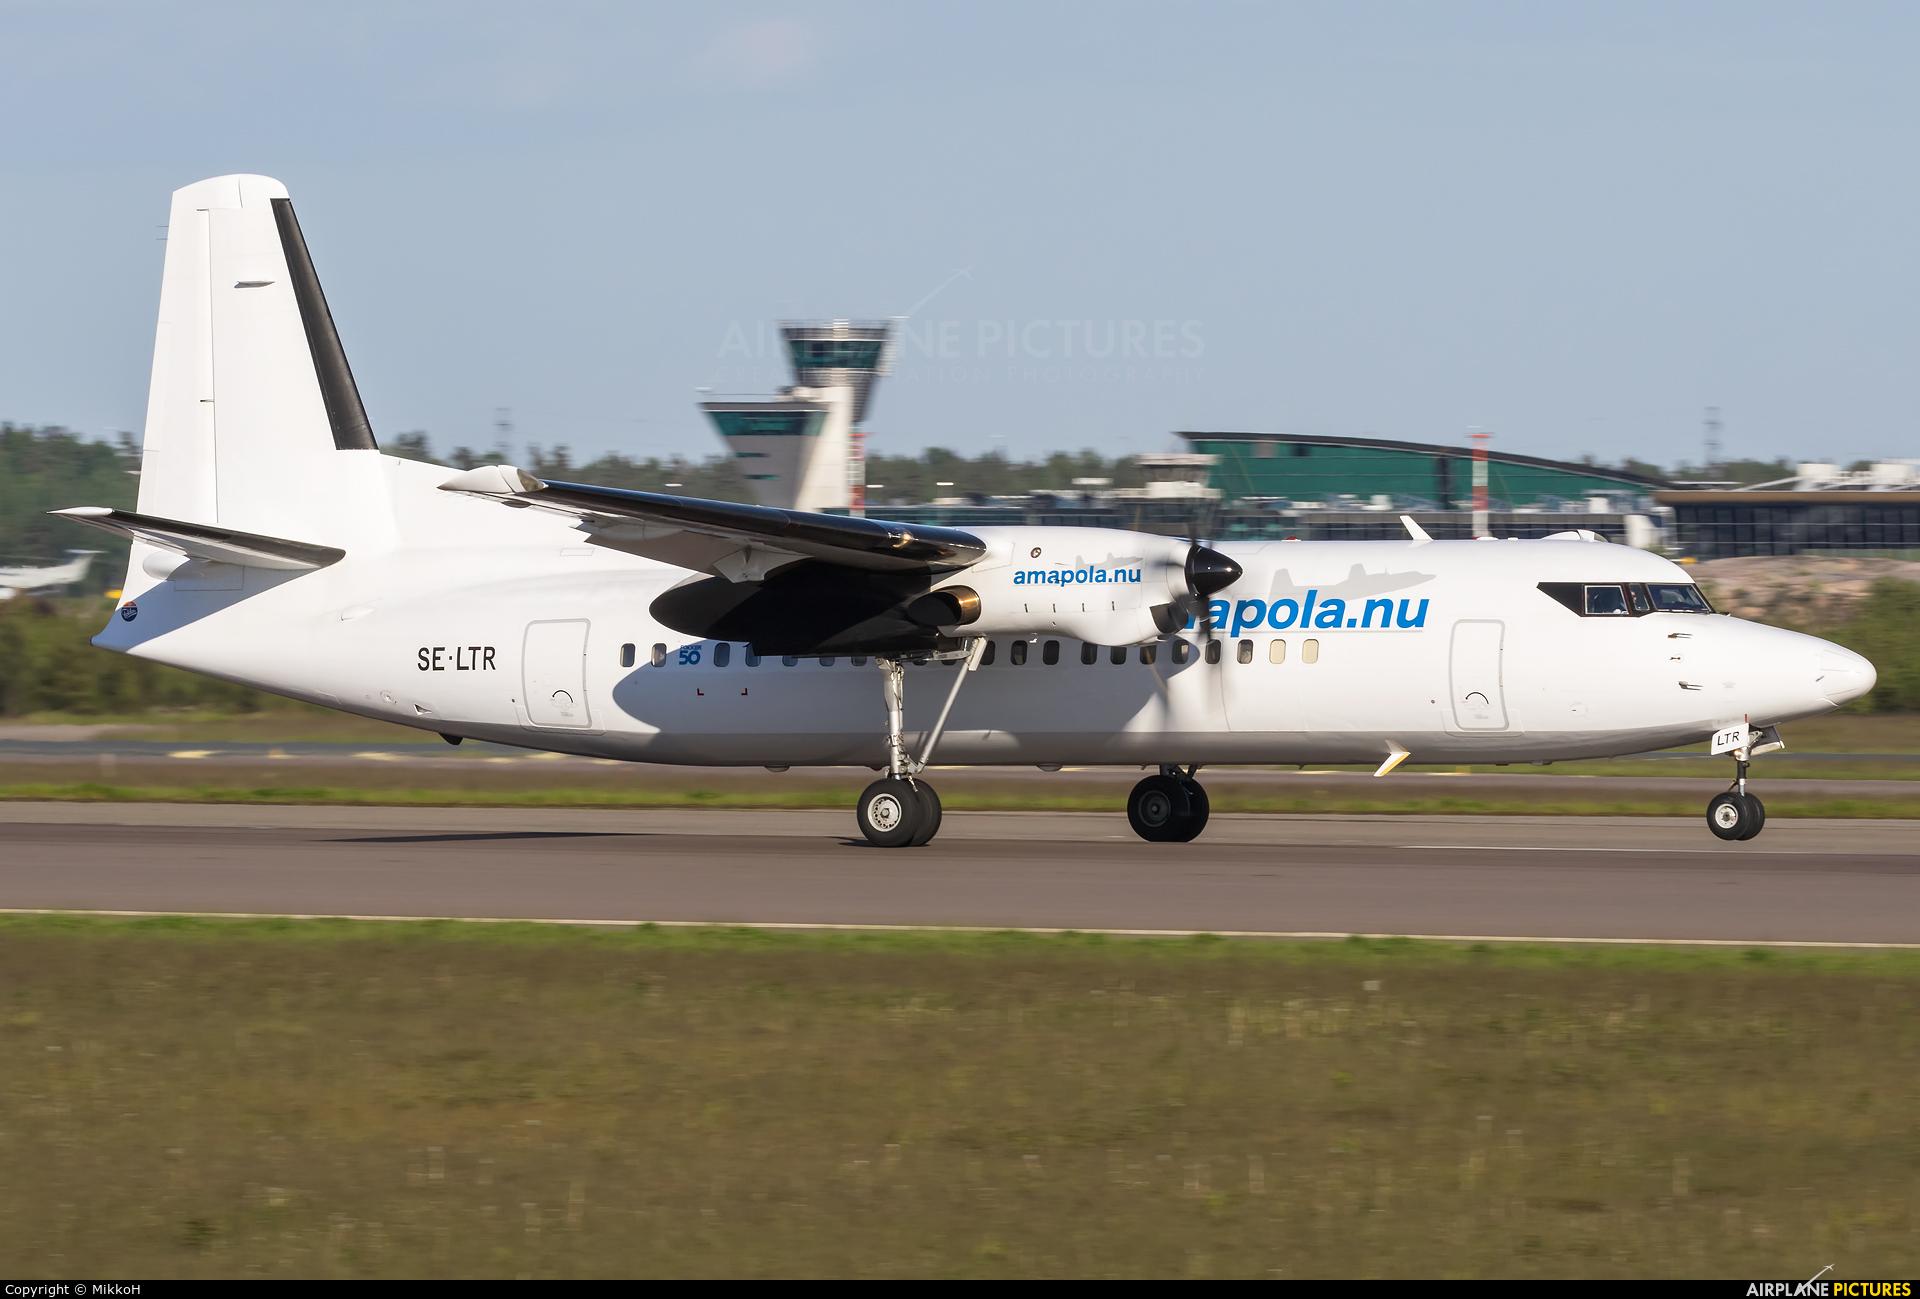 AmaPola Flyg SE-LTR aircraft at Helsinki - Vantaa